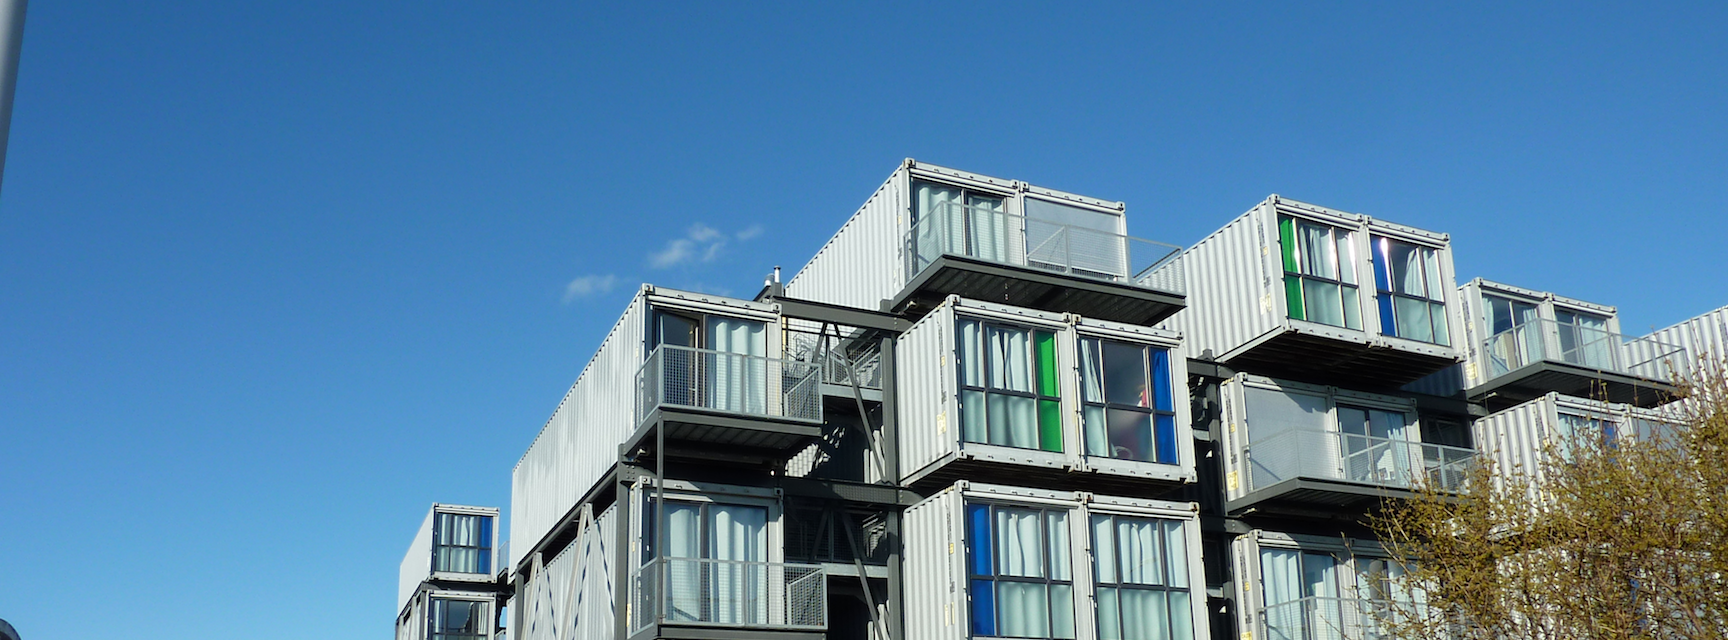 Le Havre - Shipping Container Student Accommodation @ 49 Quai de la Saône